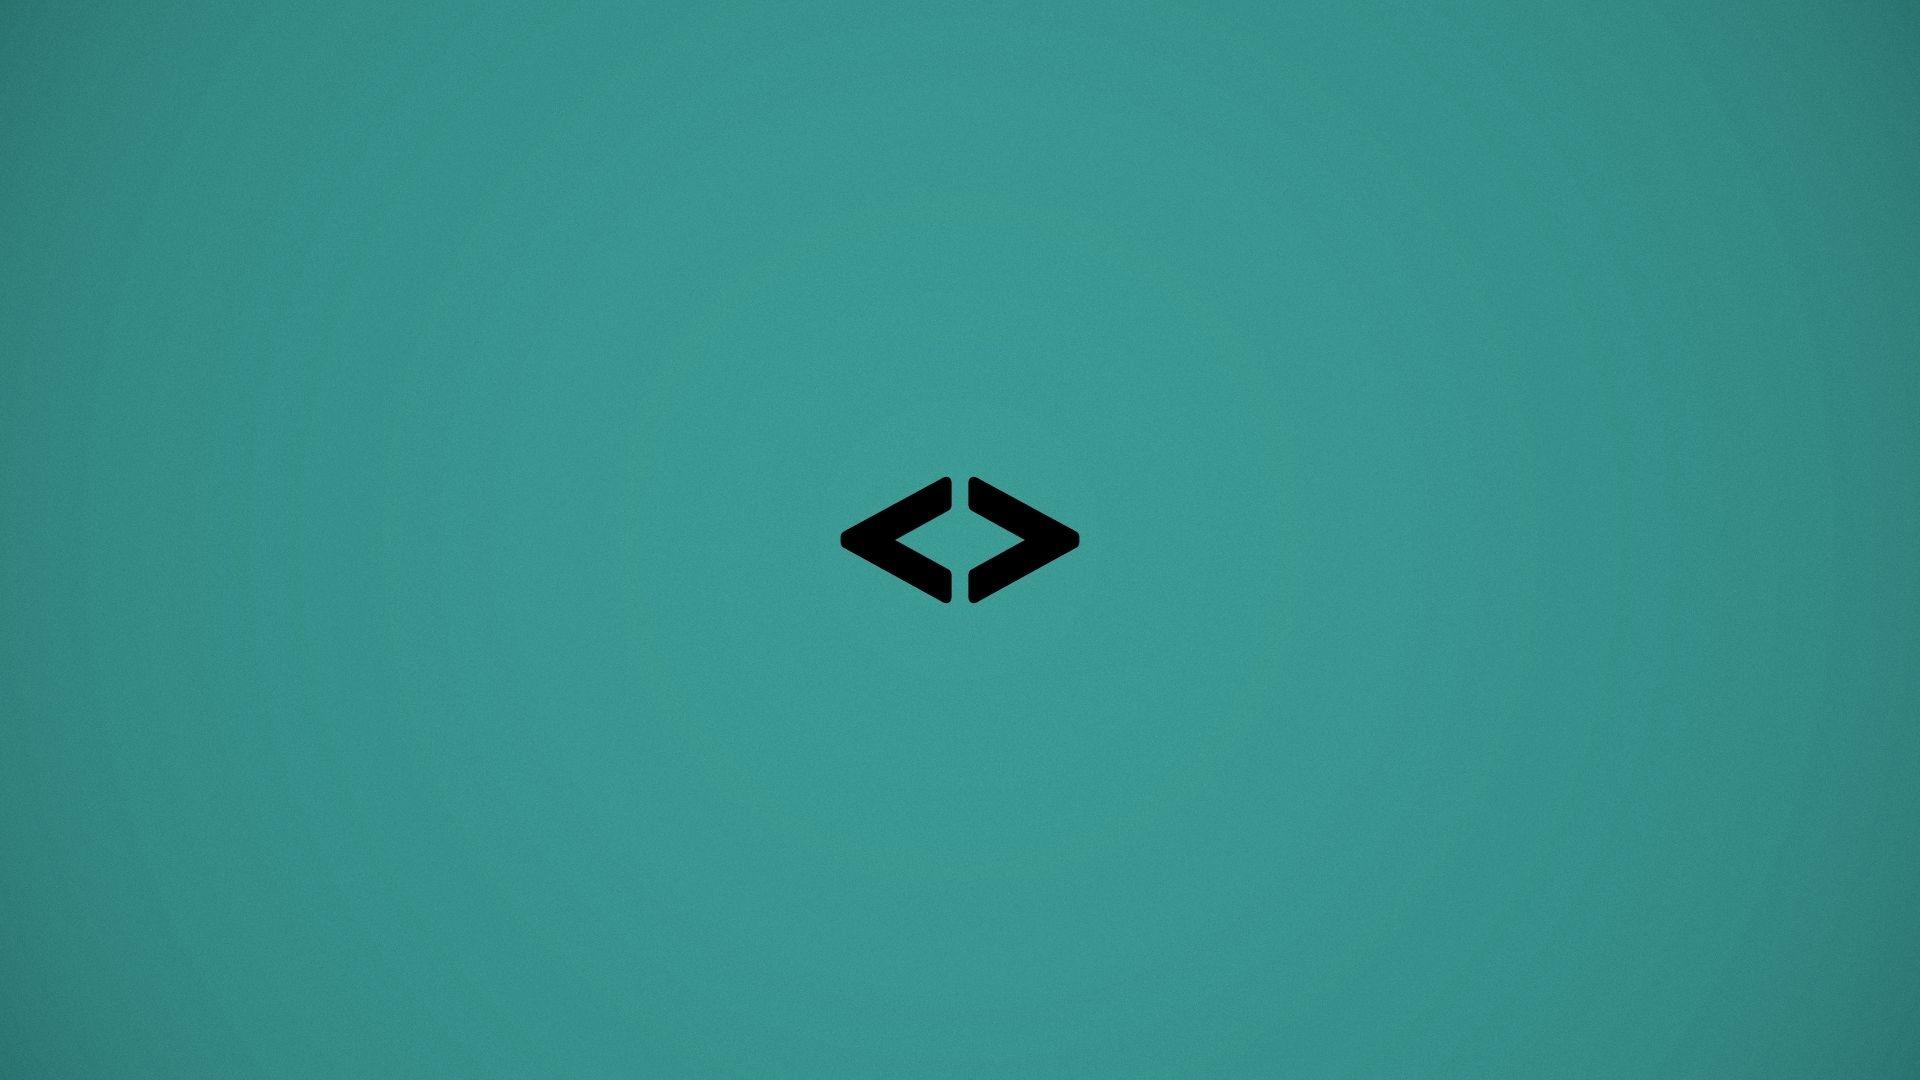 Programming Minimalist Free Wallpaper and Background